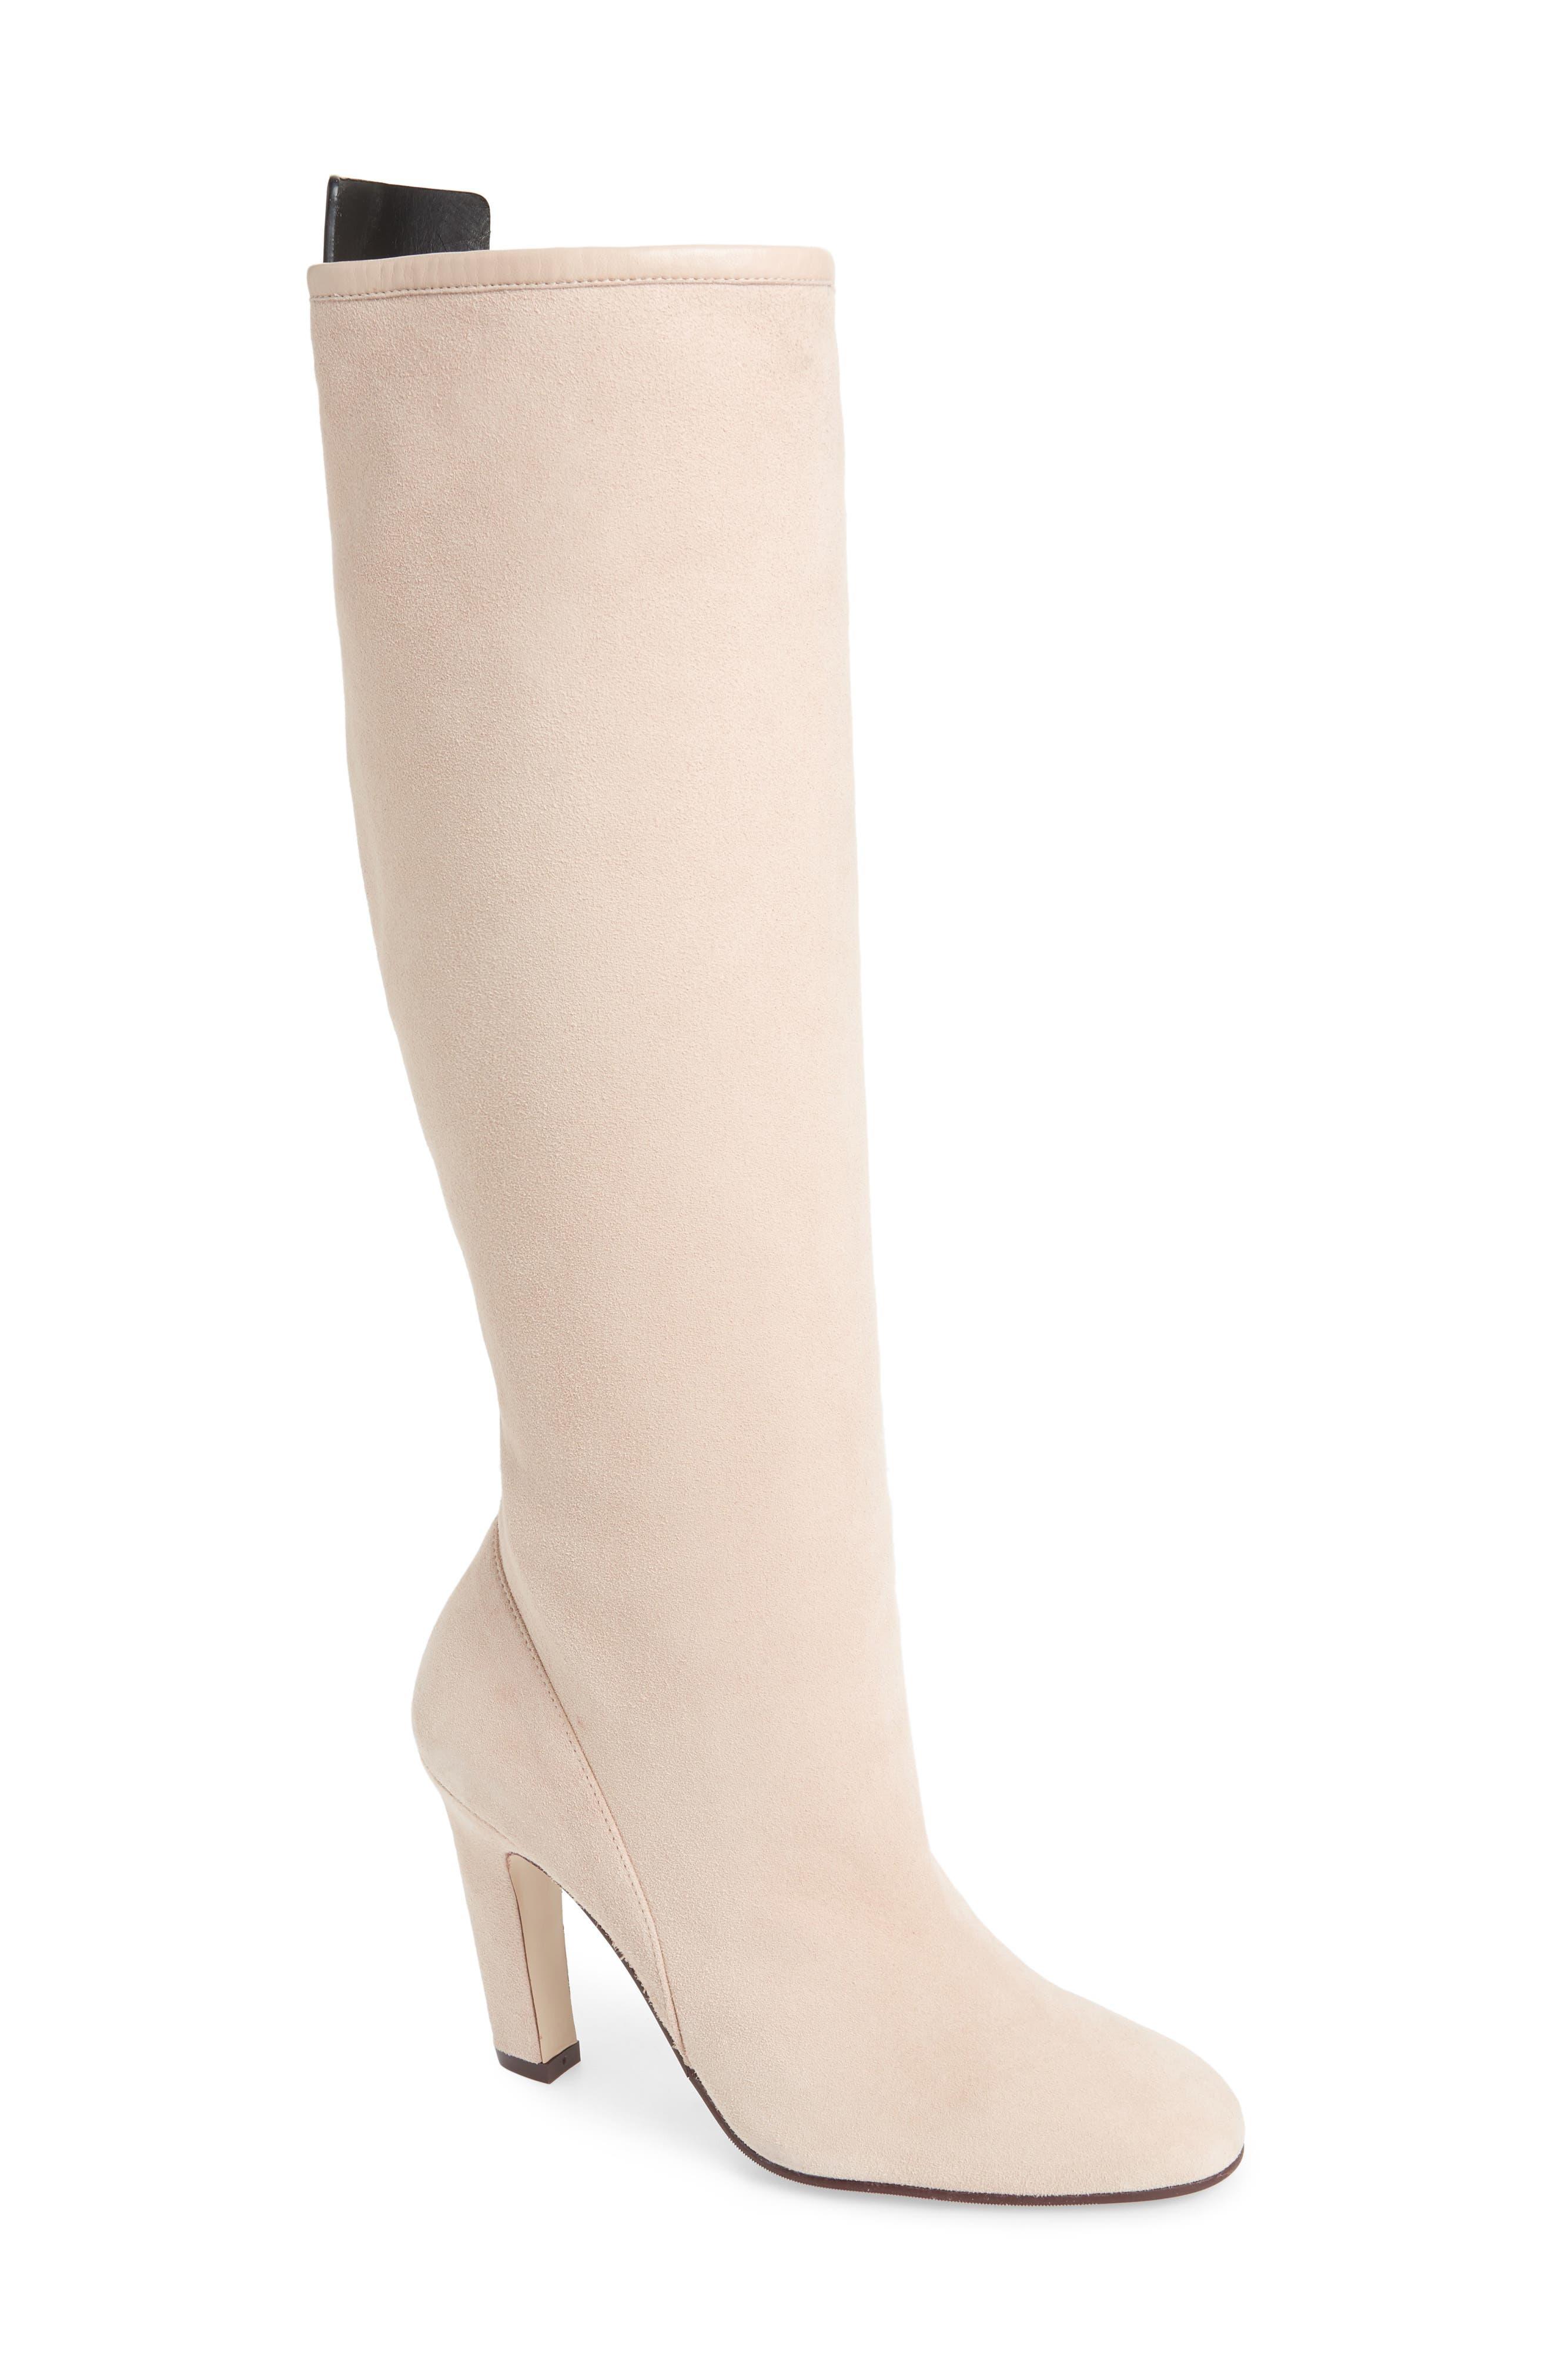 Stuart Weitzman Charlie Knee High Boot- Pink